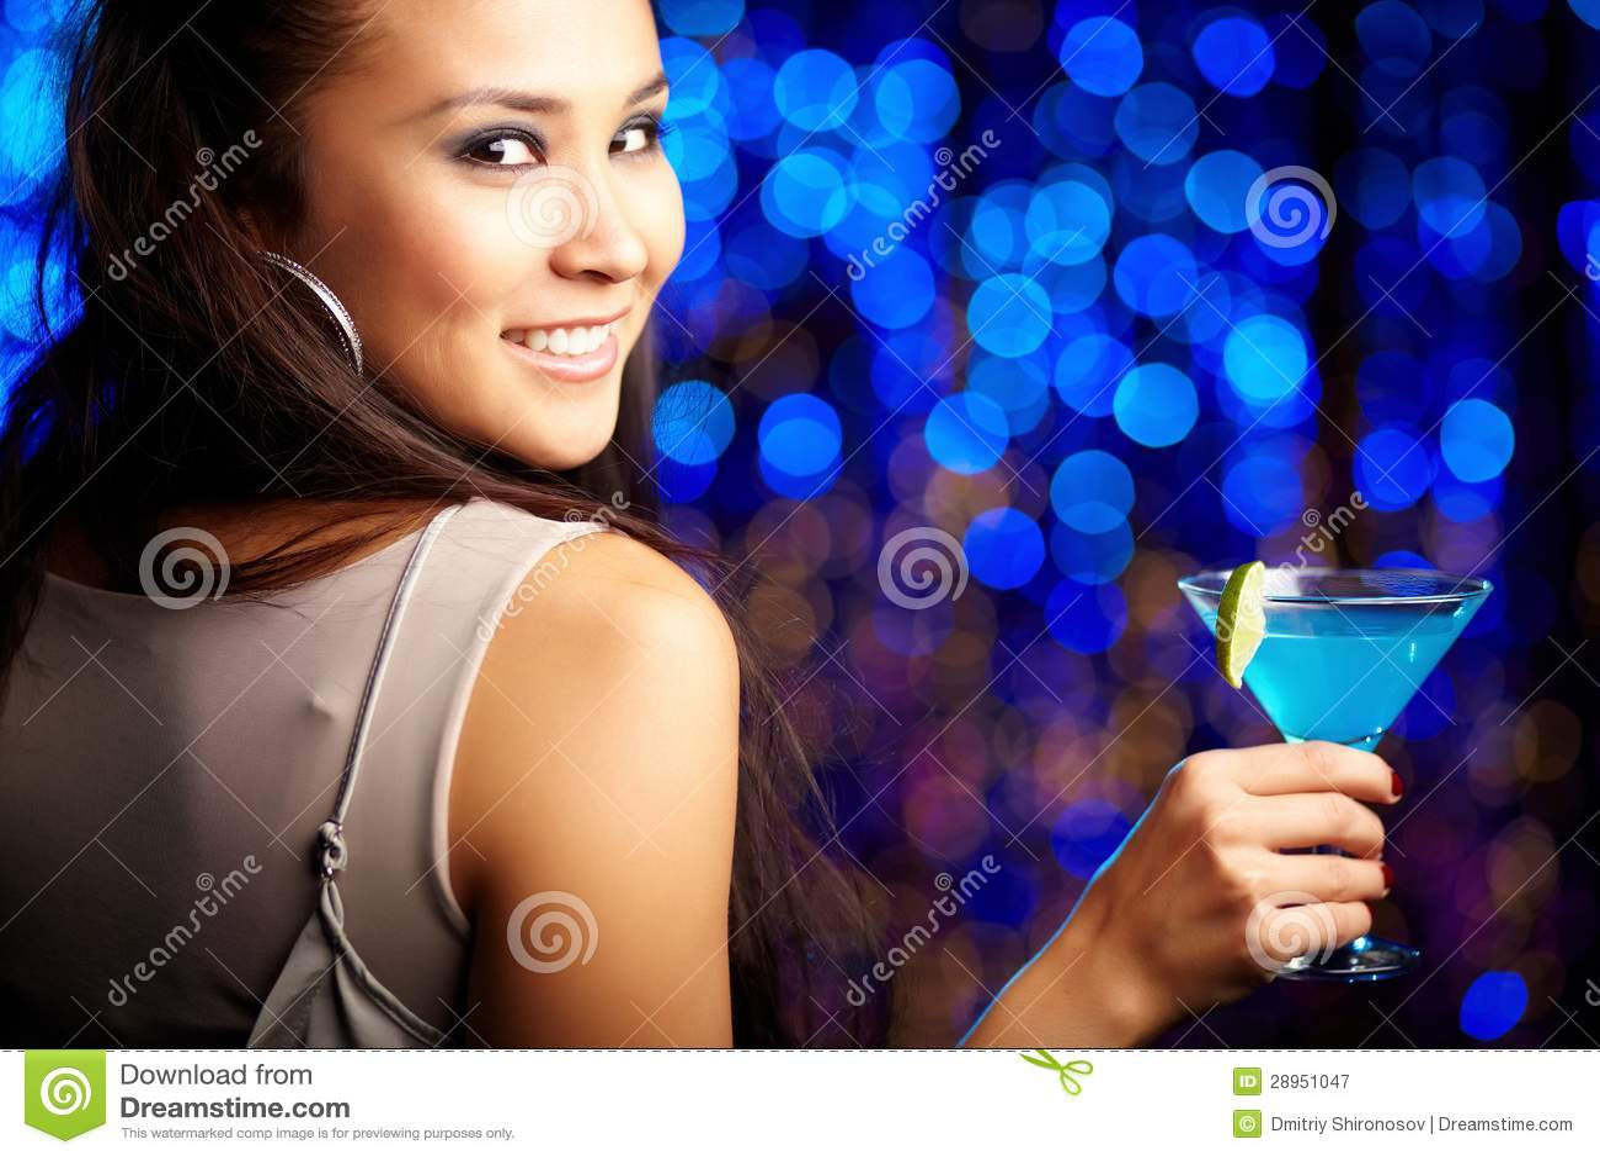 girl cocktail